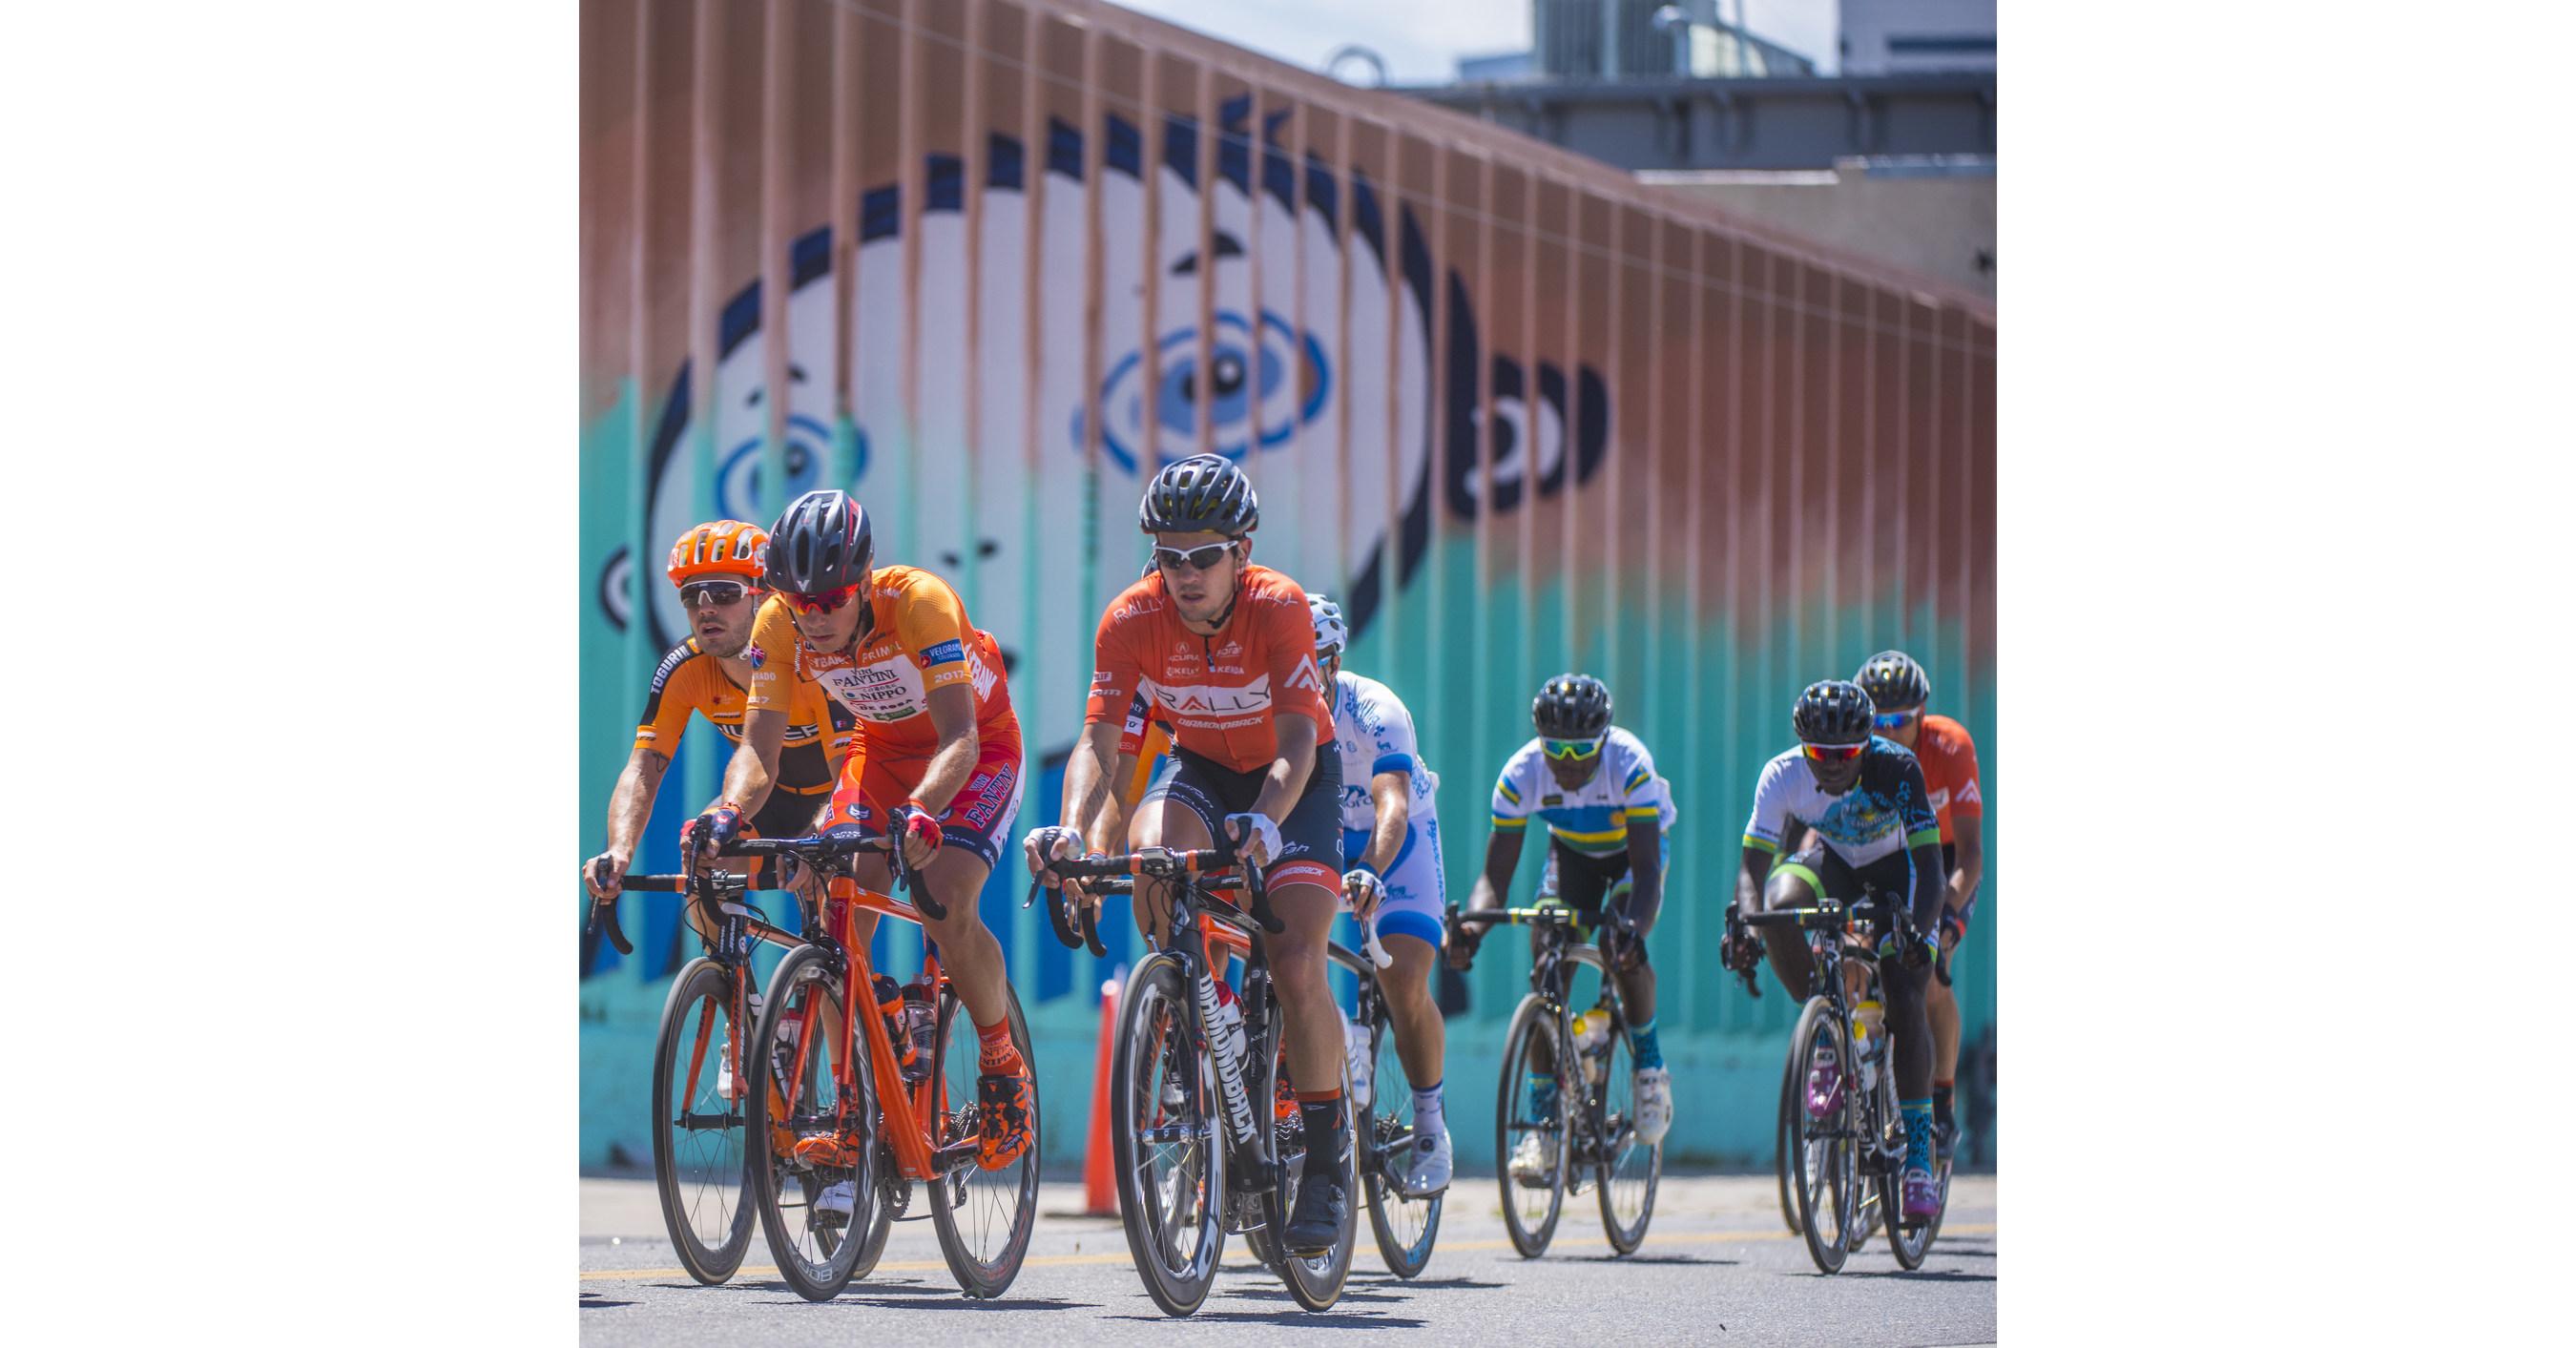 Colorado Classic Announces Initial Men's Rosters